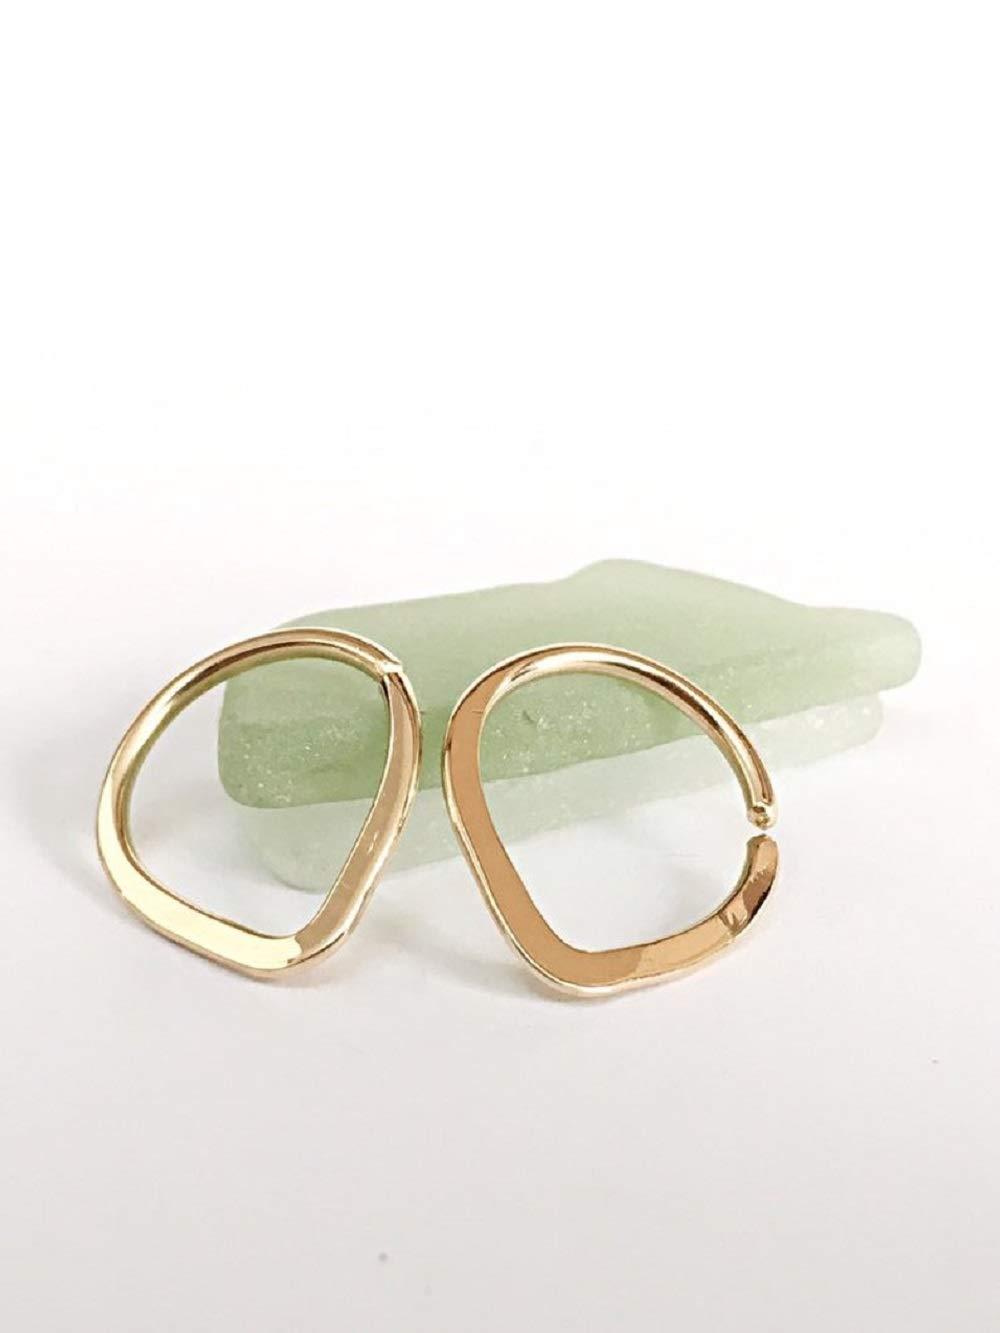 Nipple Ring Yellow Rose Gold 14K 18K Diamond Cut Tribal Body Piercing Hoop